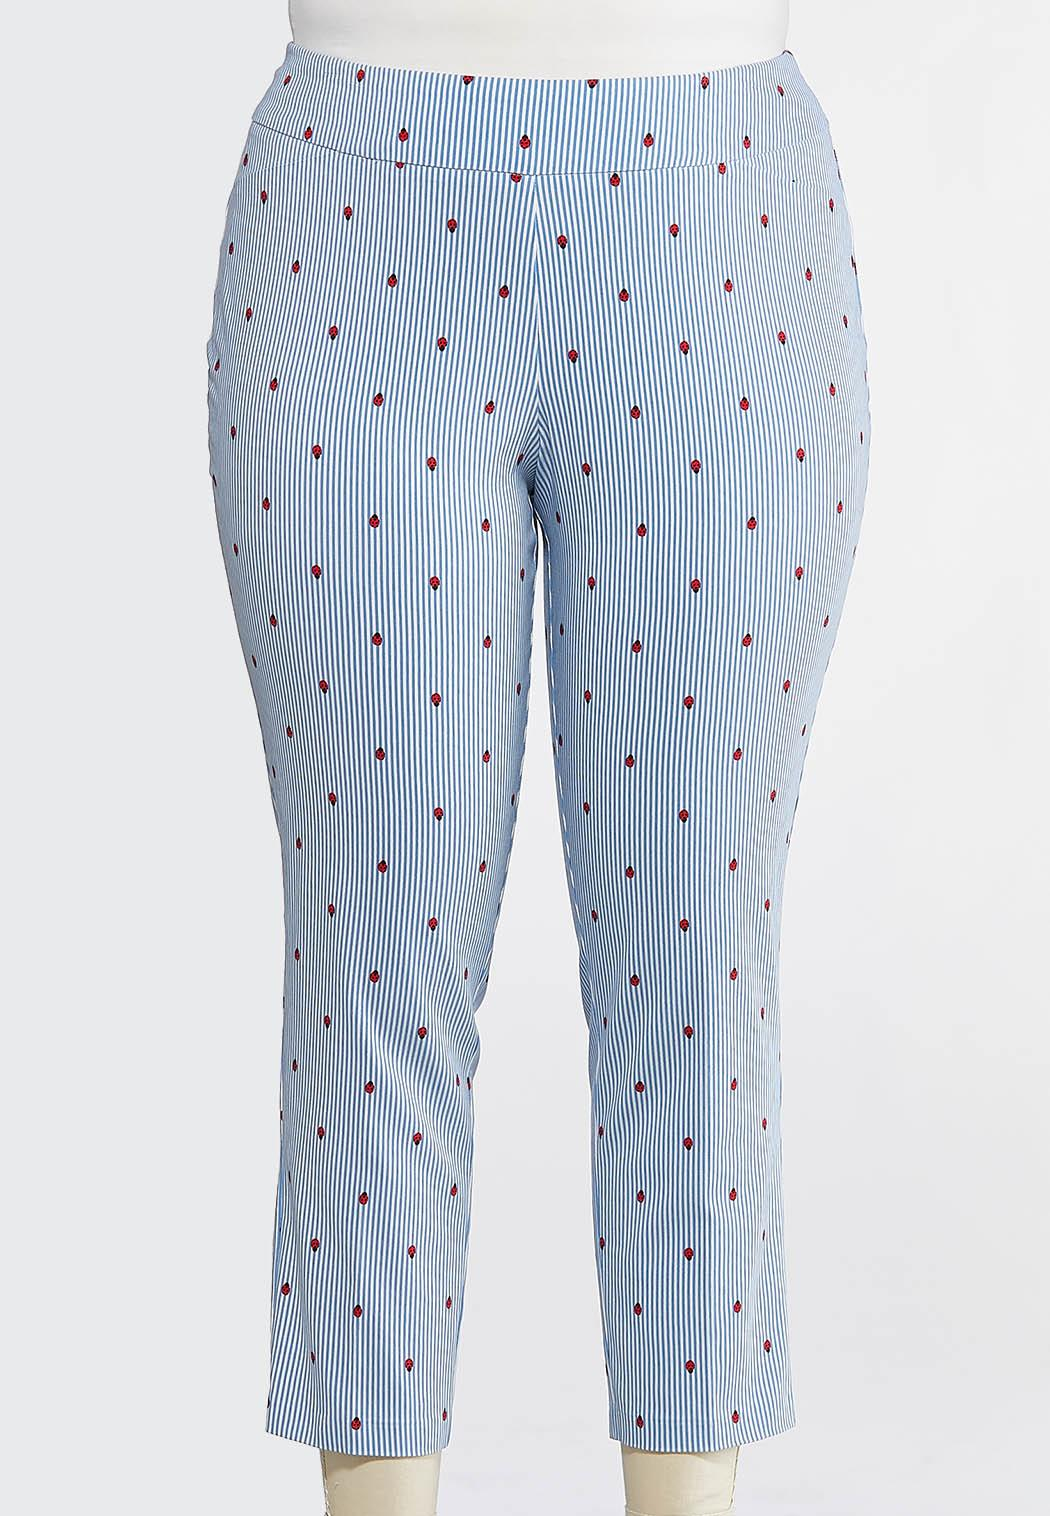 Plus Size Ladybug Bengaline Pants